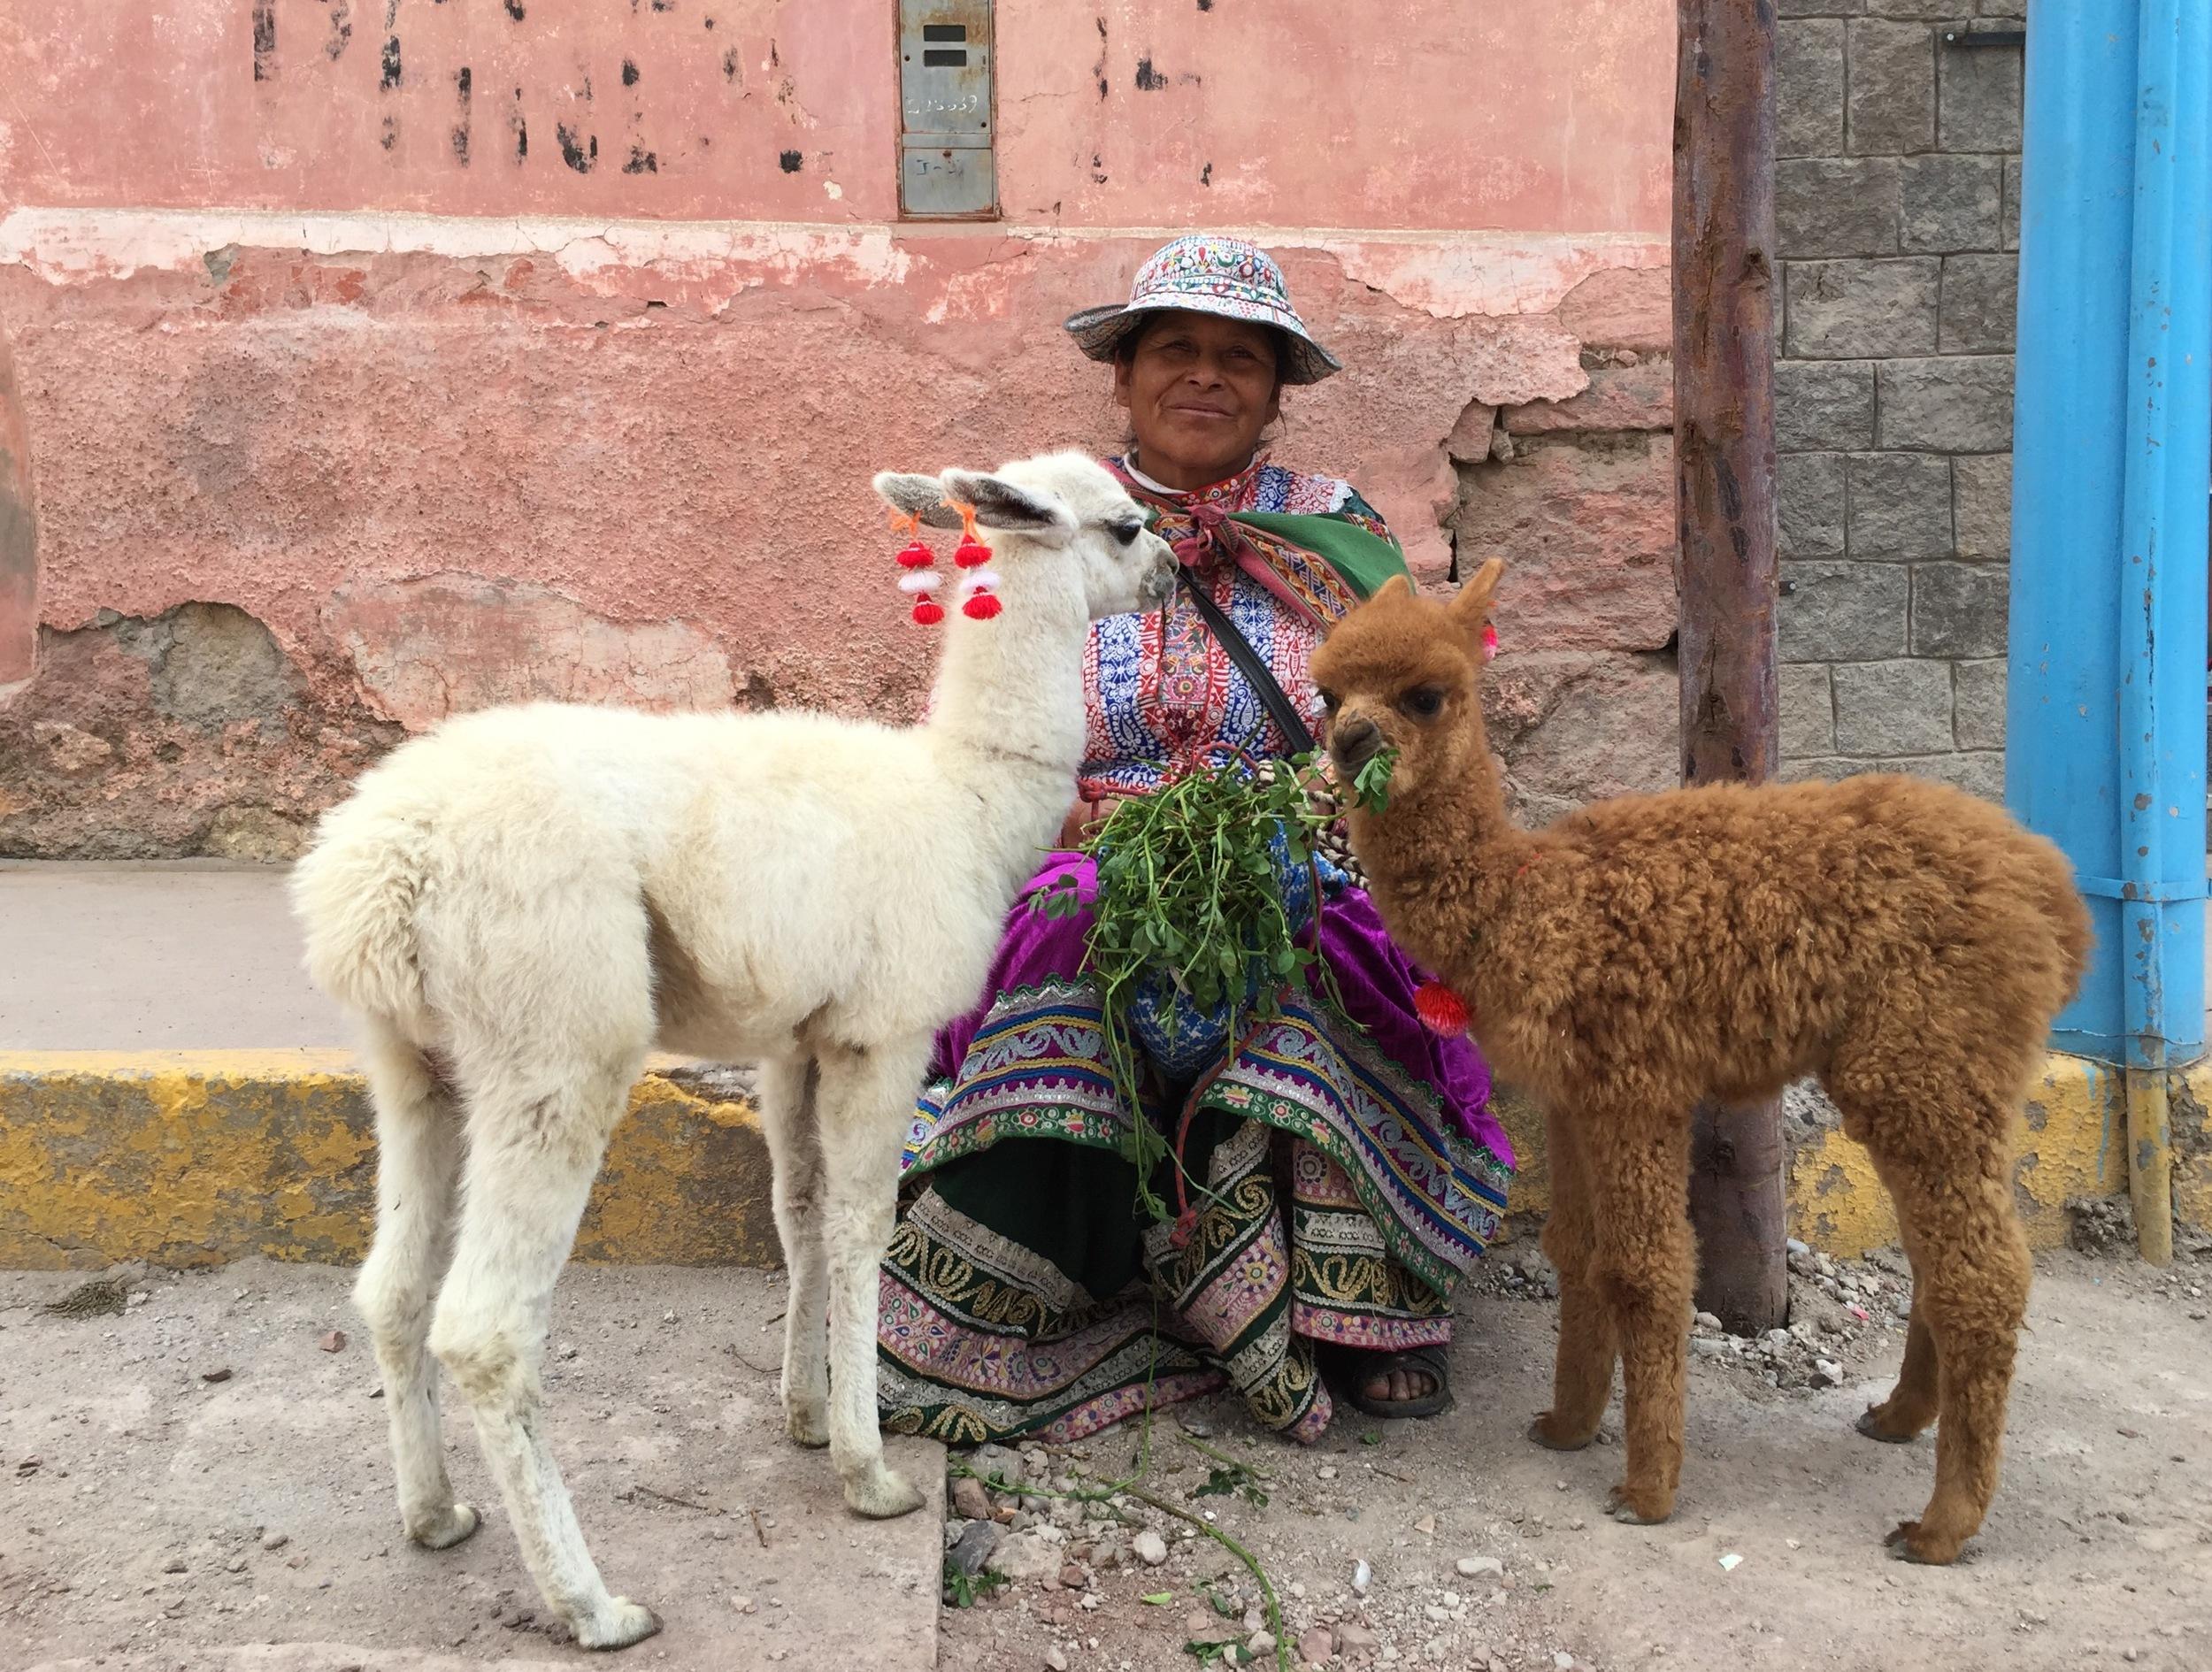 På torget i landsbyen Chivay i Colcadalen møtte jeg denne indianerkvinnen med en lamababy til venstre og en alpakkababy til høyre.